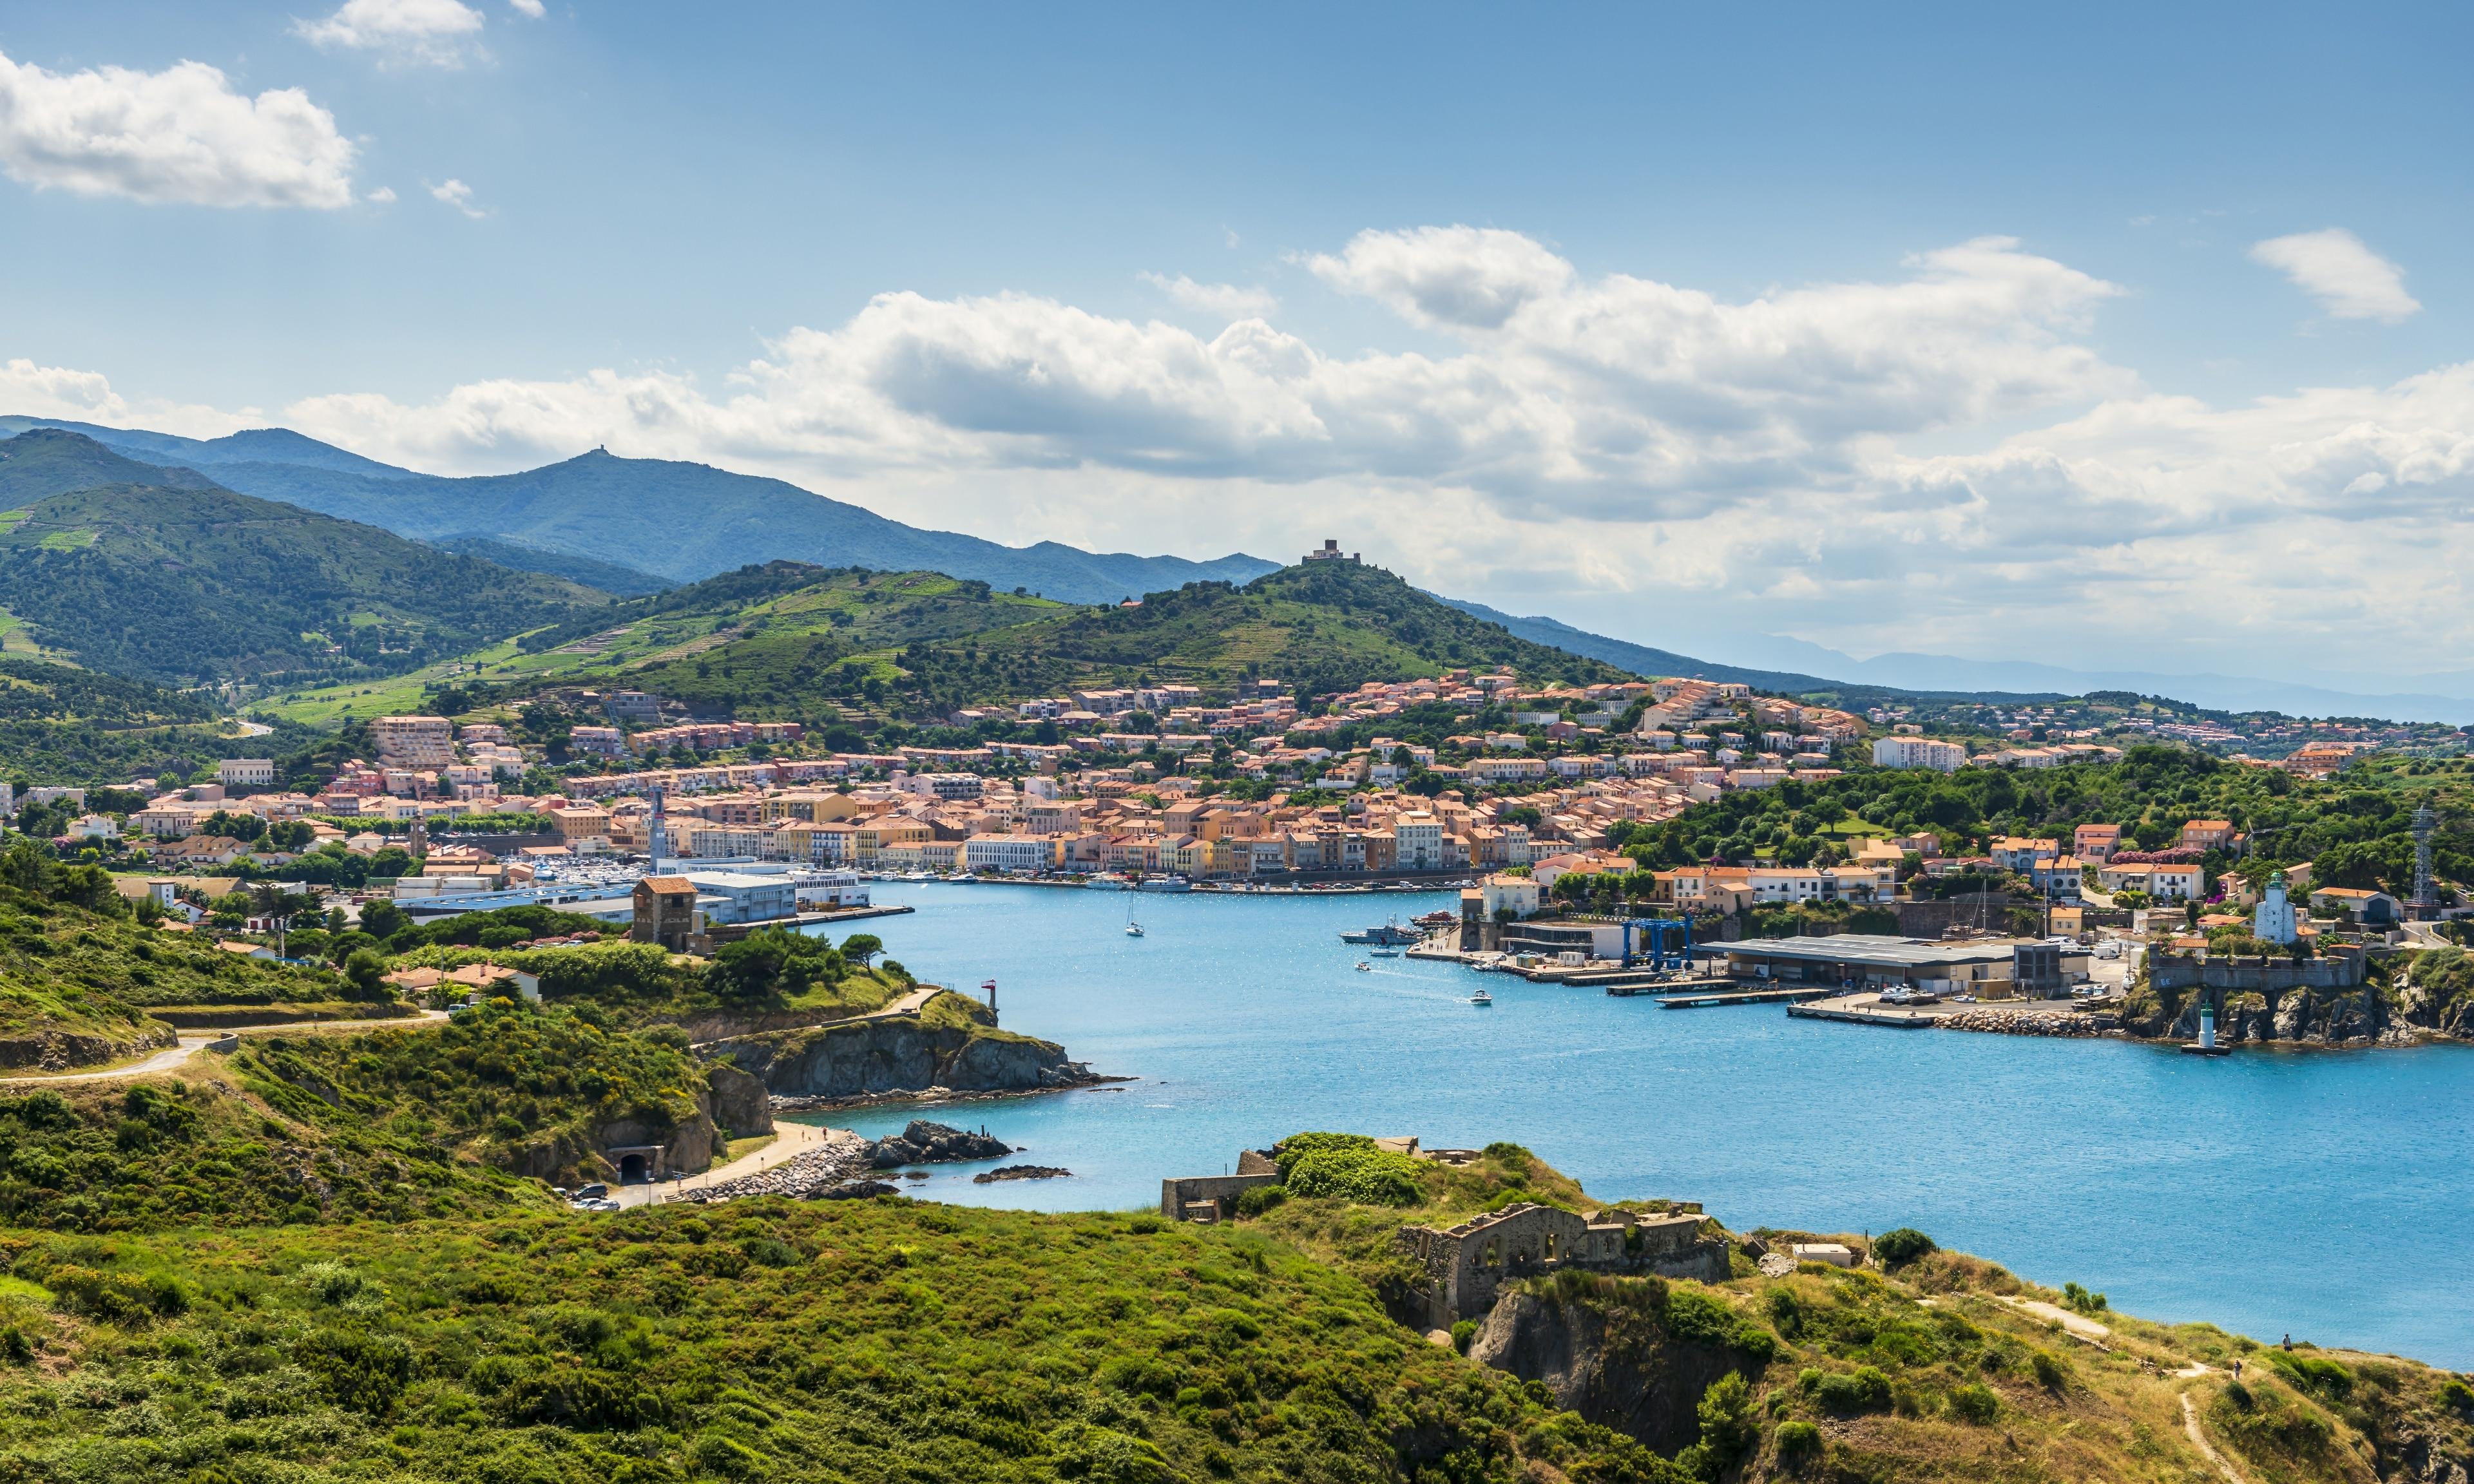 Port-Vendres, Pyrenees-Orientales, France